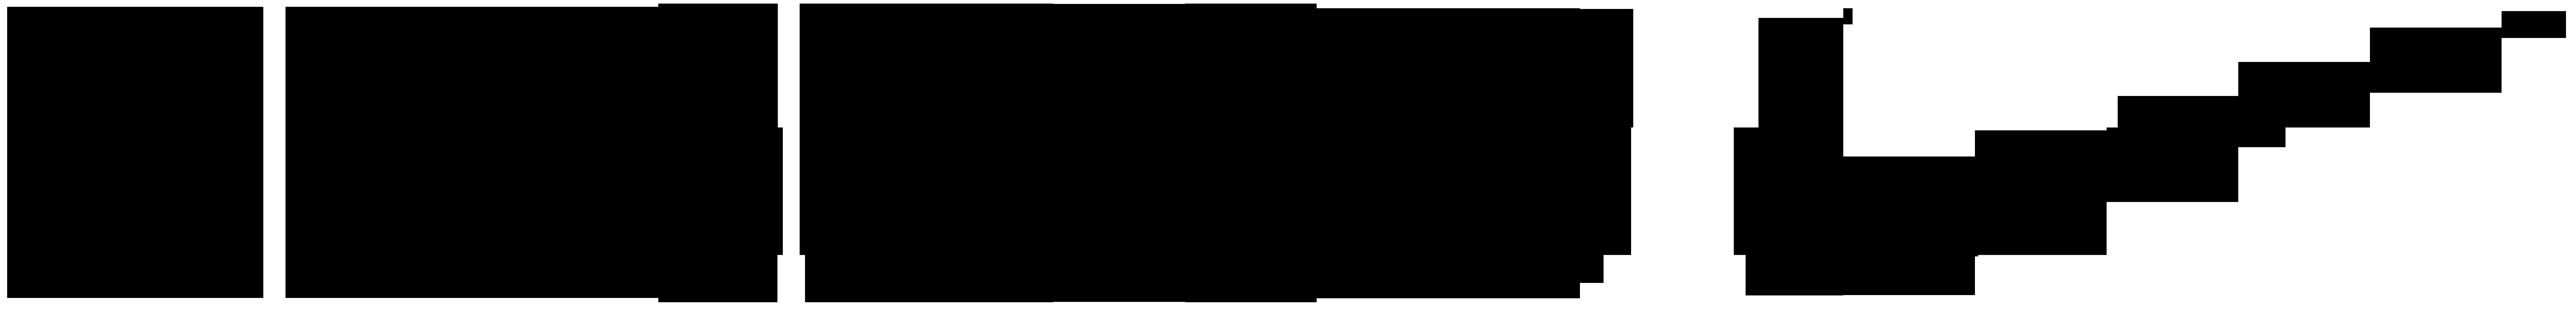 Nike_Soccer_Logo_Horiz_hi_black5b35d.png